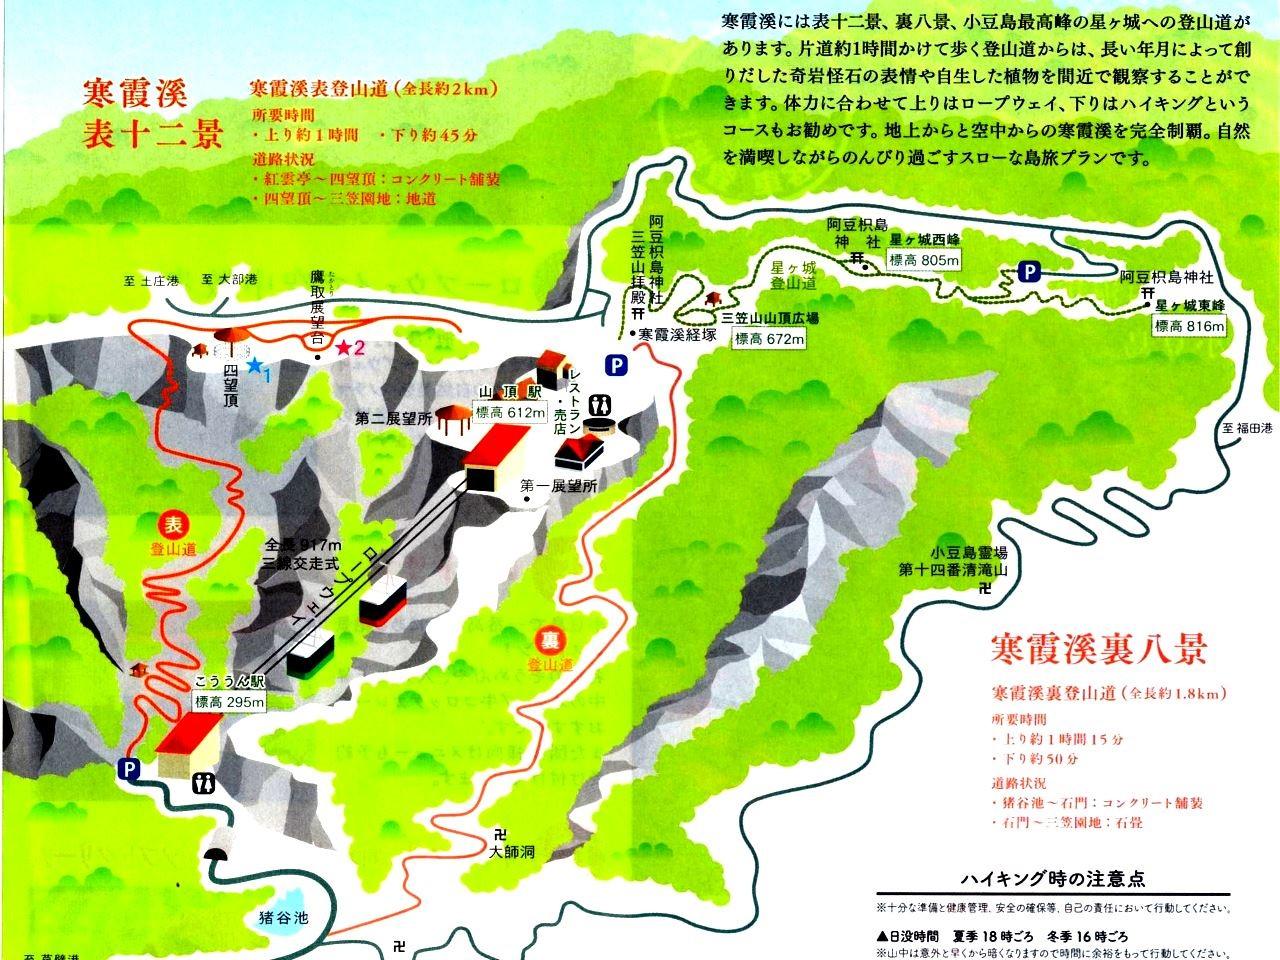 01b 寒霞渓登山コース